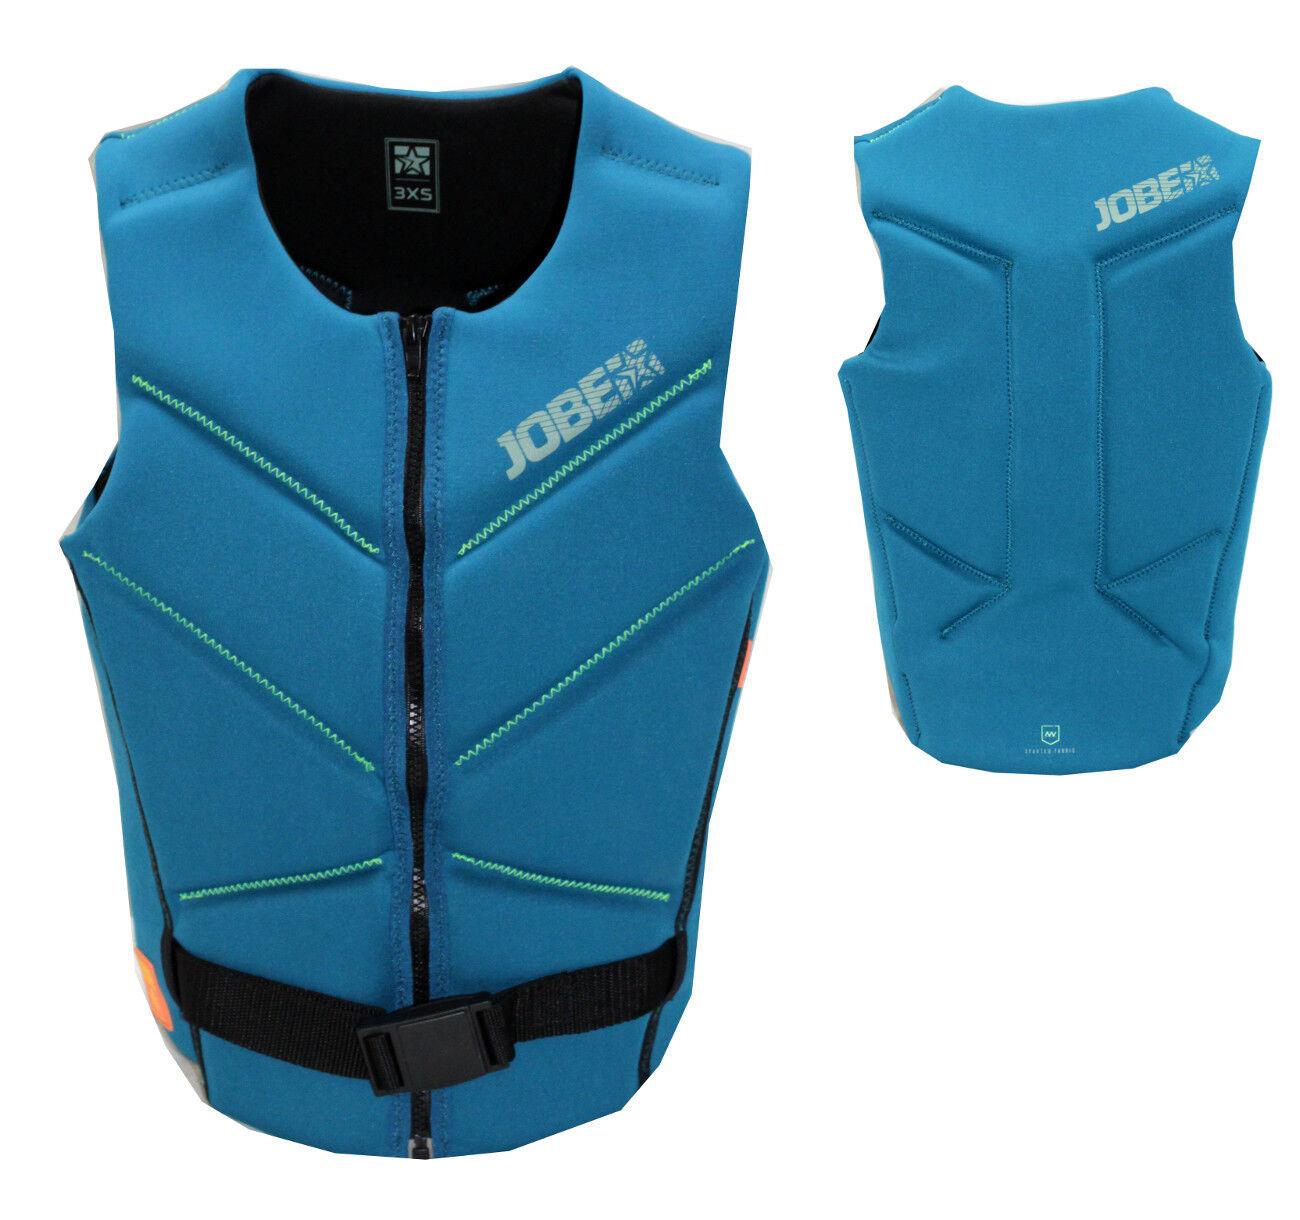 Jobe 3 D Comp Vest Teal Men NEU Wakeboarden Weste Männer Surfen Kiten G-7-9